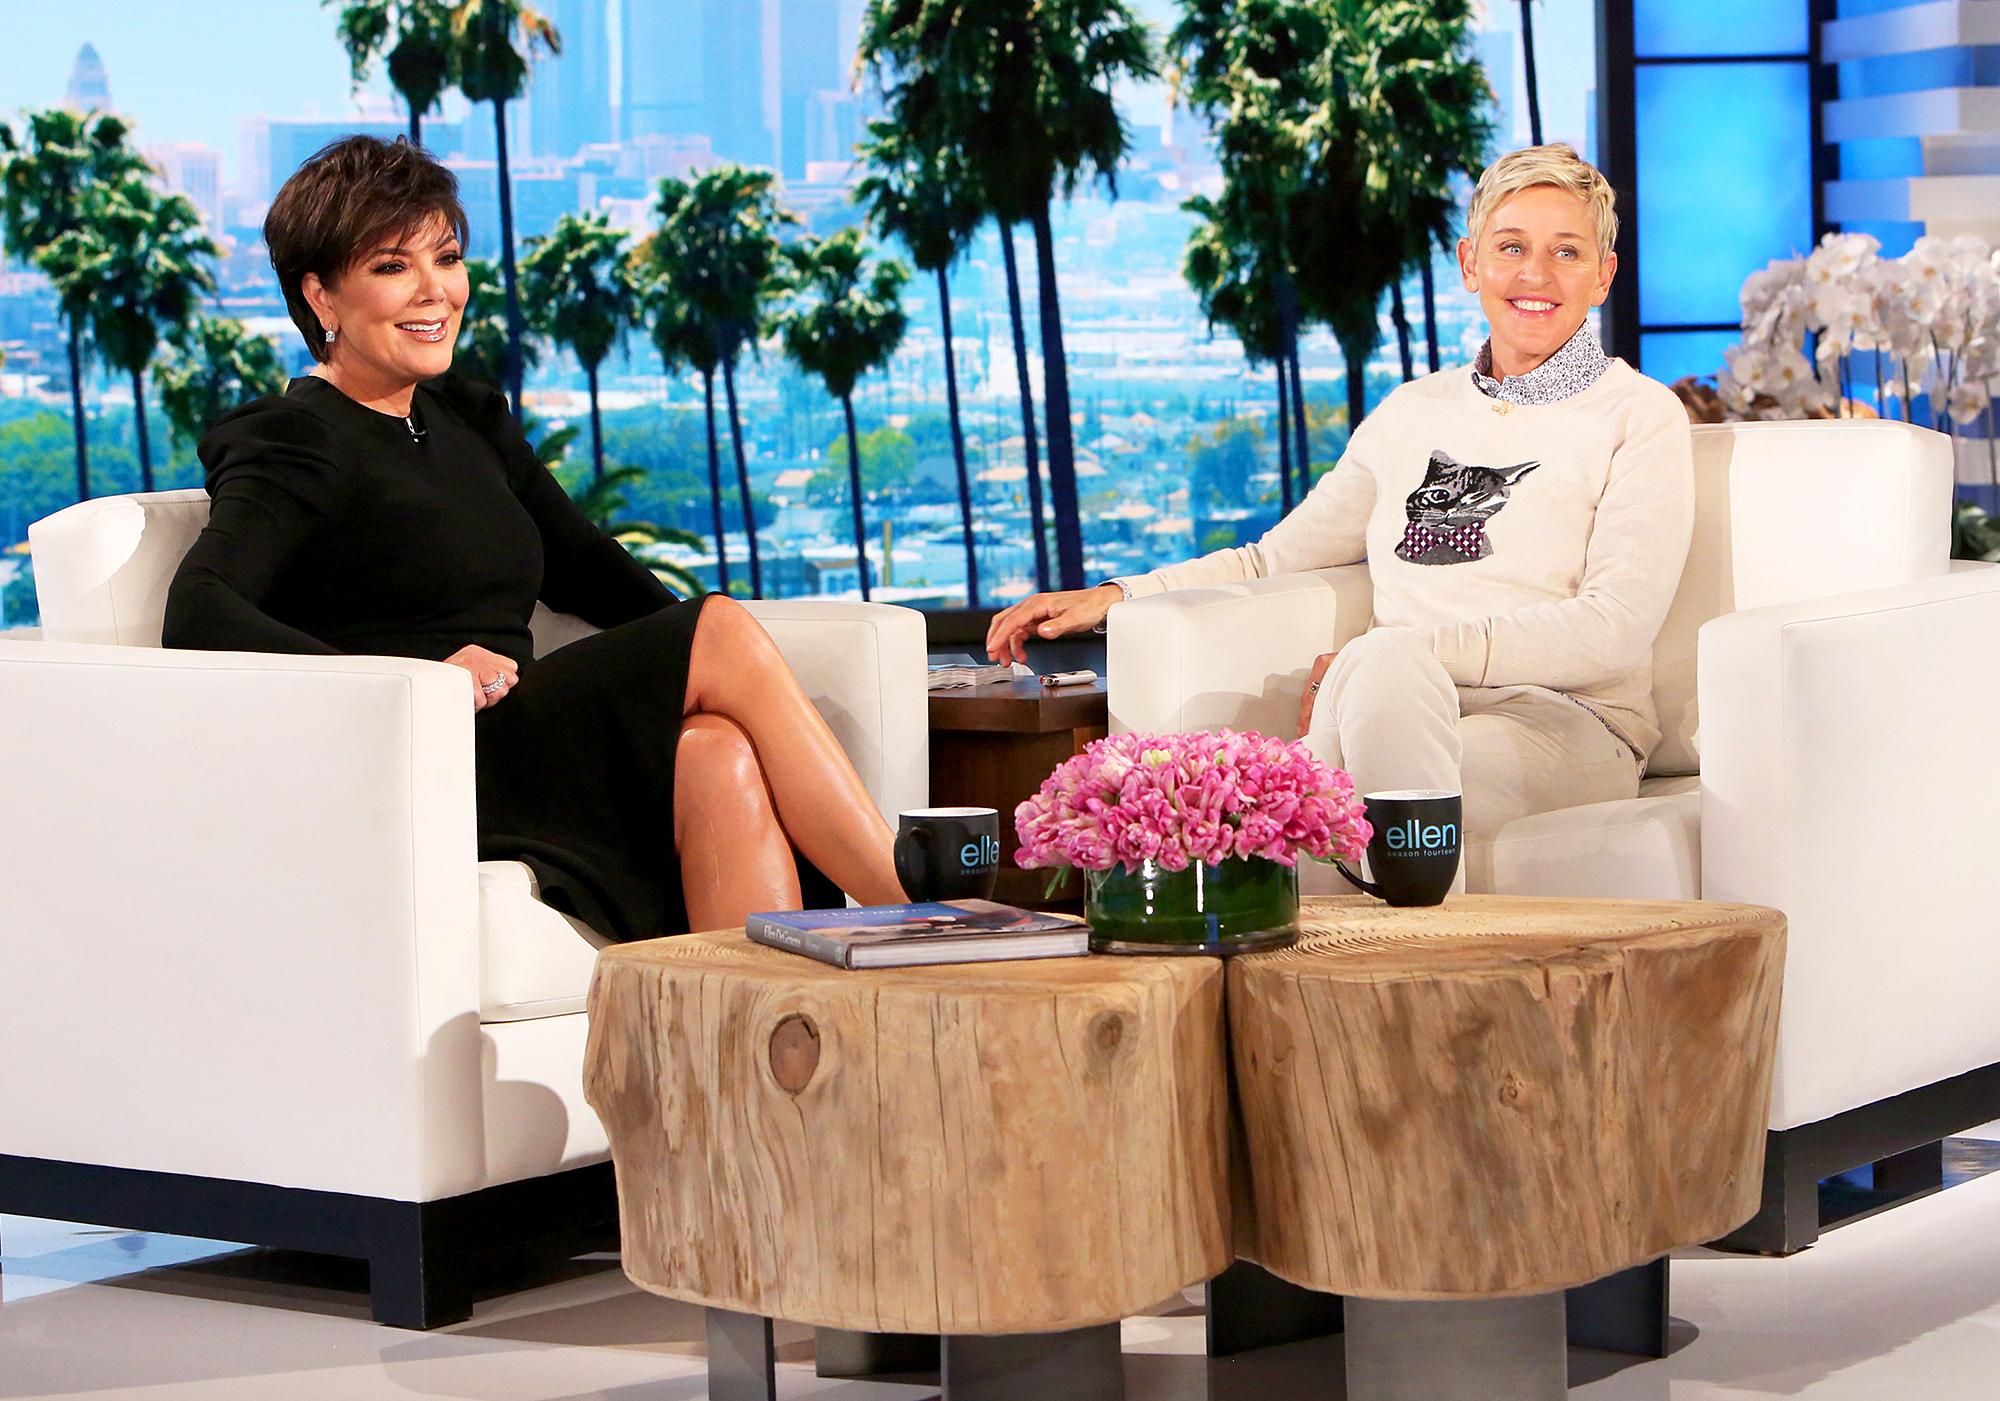 Kris Jenner and Ellen DeGeneres